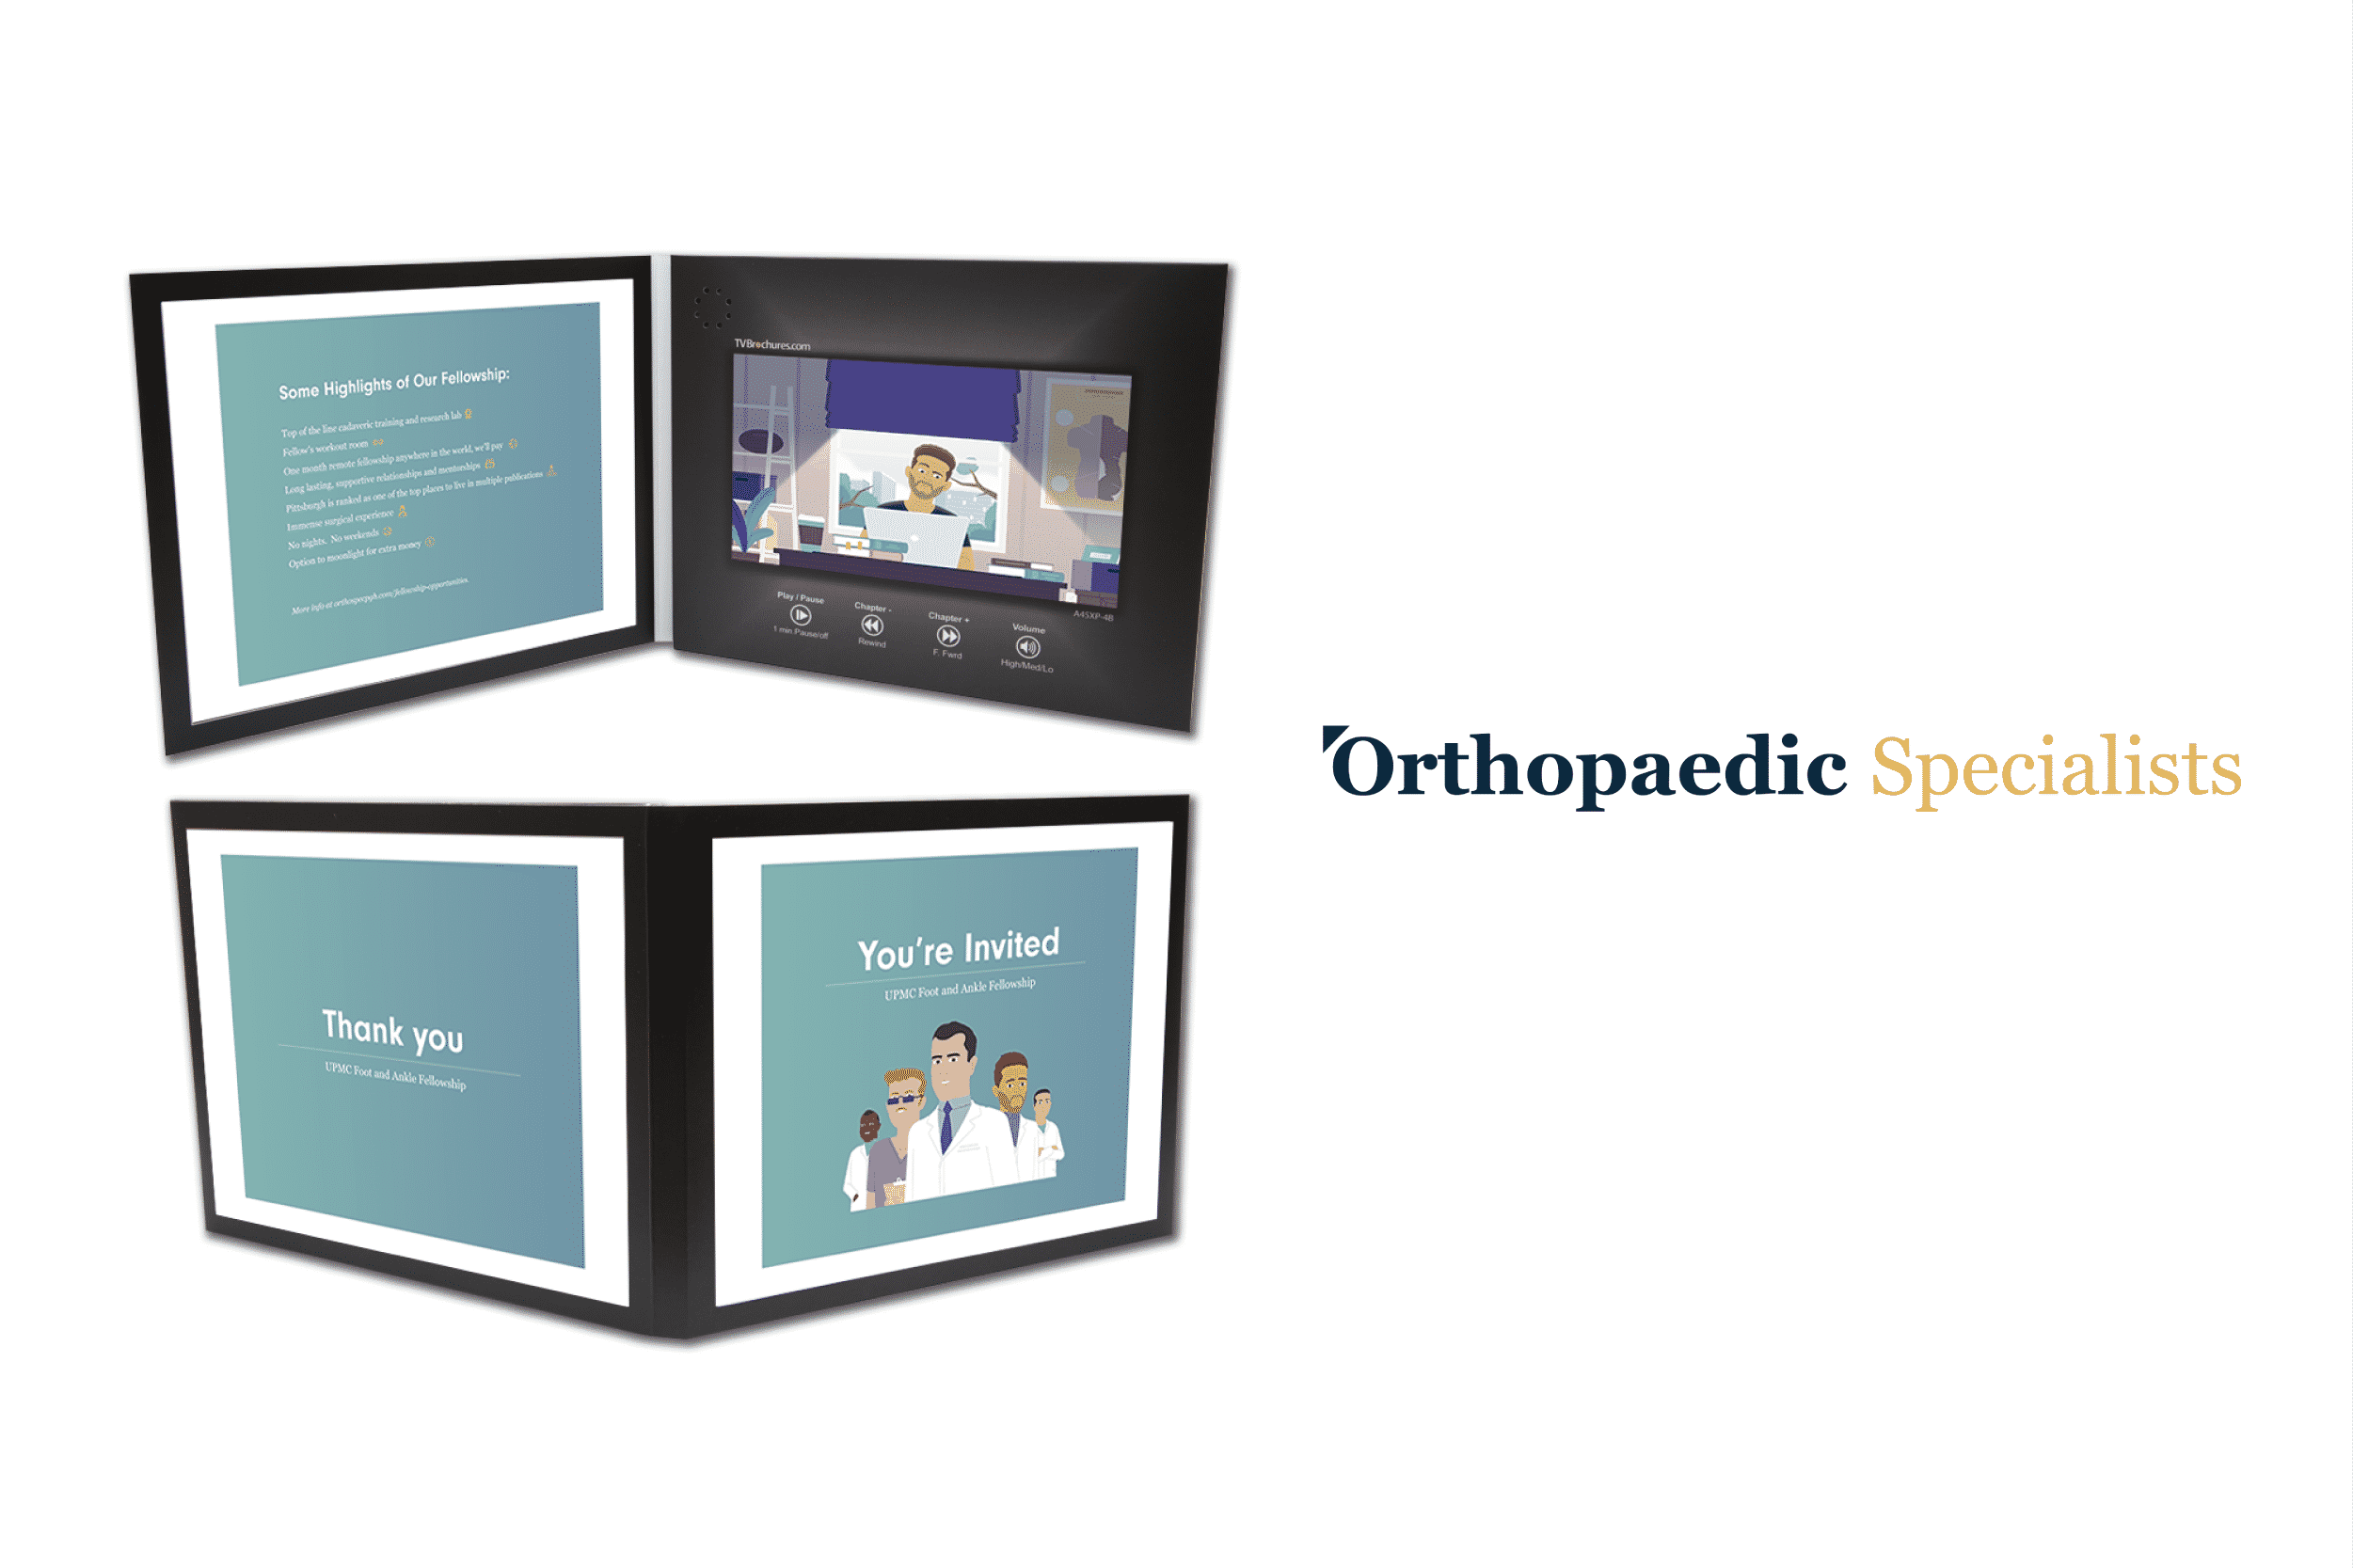 orthopeadic specialist video card deisgn